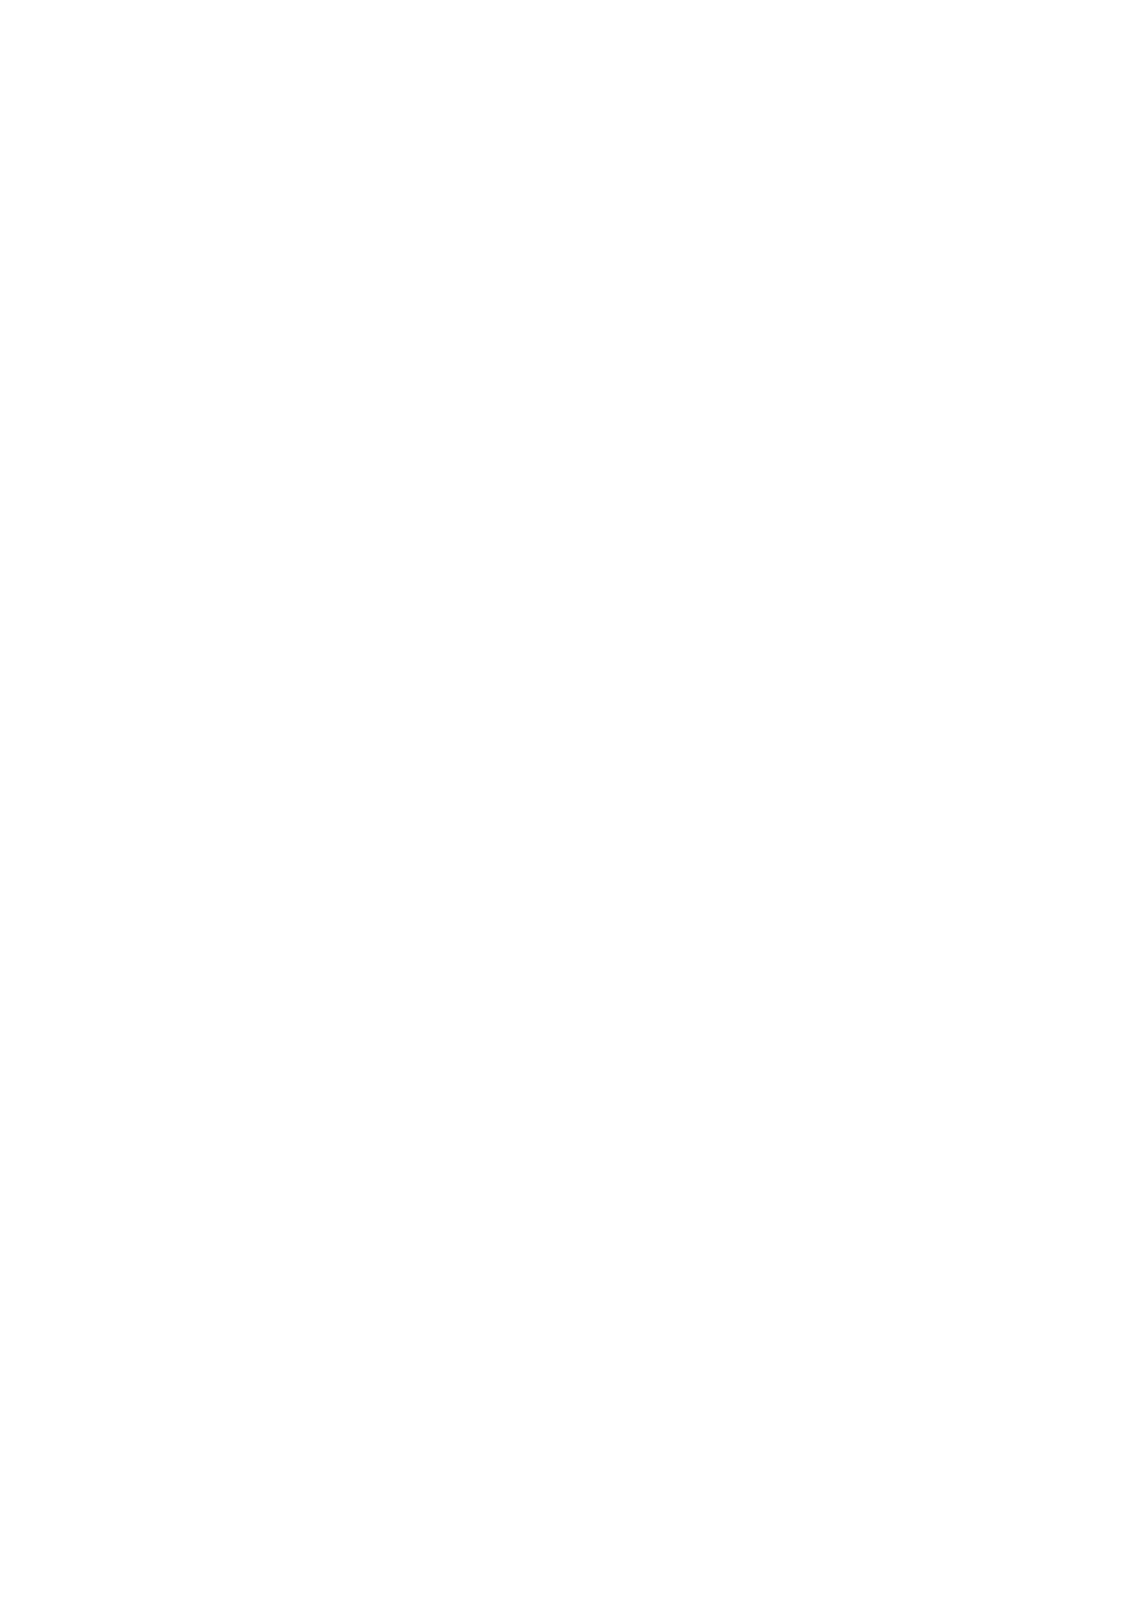 [Nihohuhehon (Supurai)] WhiteBrim Royal Maid-tai no Kenshin-Tekina Aijou o Zonbun ni Ajiwau Hon | WhiteBrim: An Appreciation Book to The Devoted Love of Royal Maid Corp (Azur Lane) [English] [Night Revenants] [Digital] 1